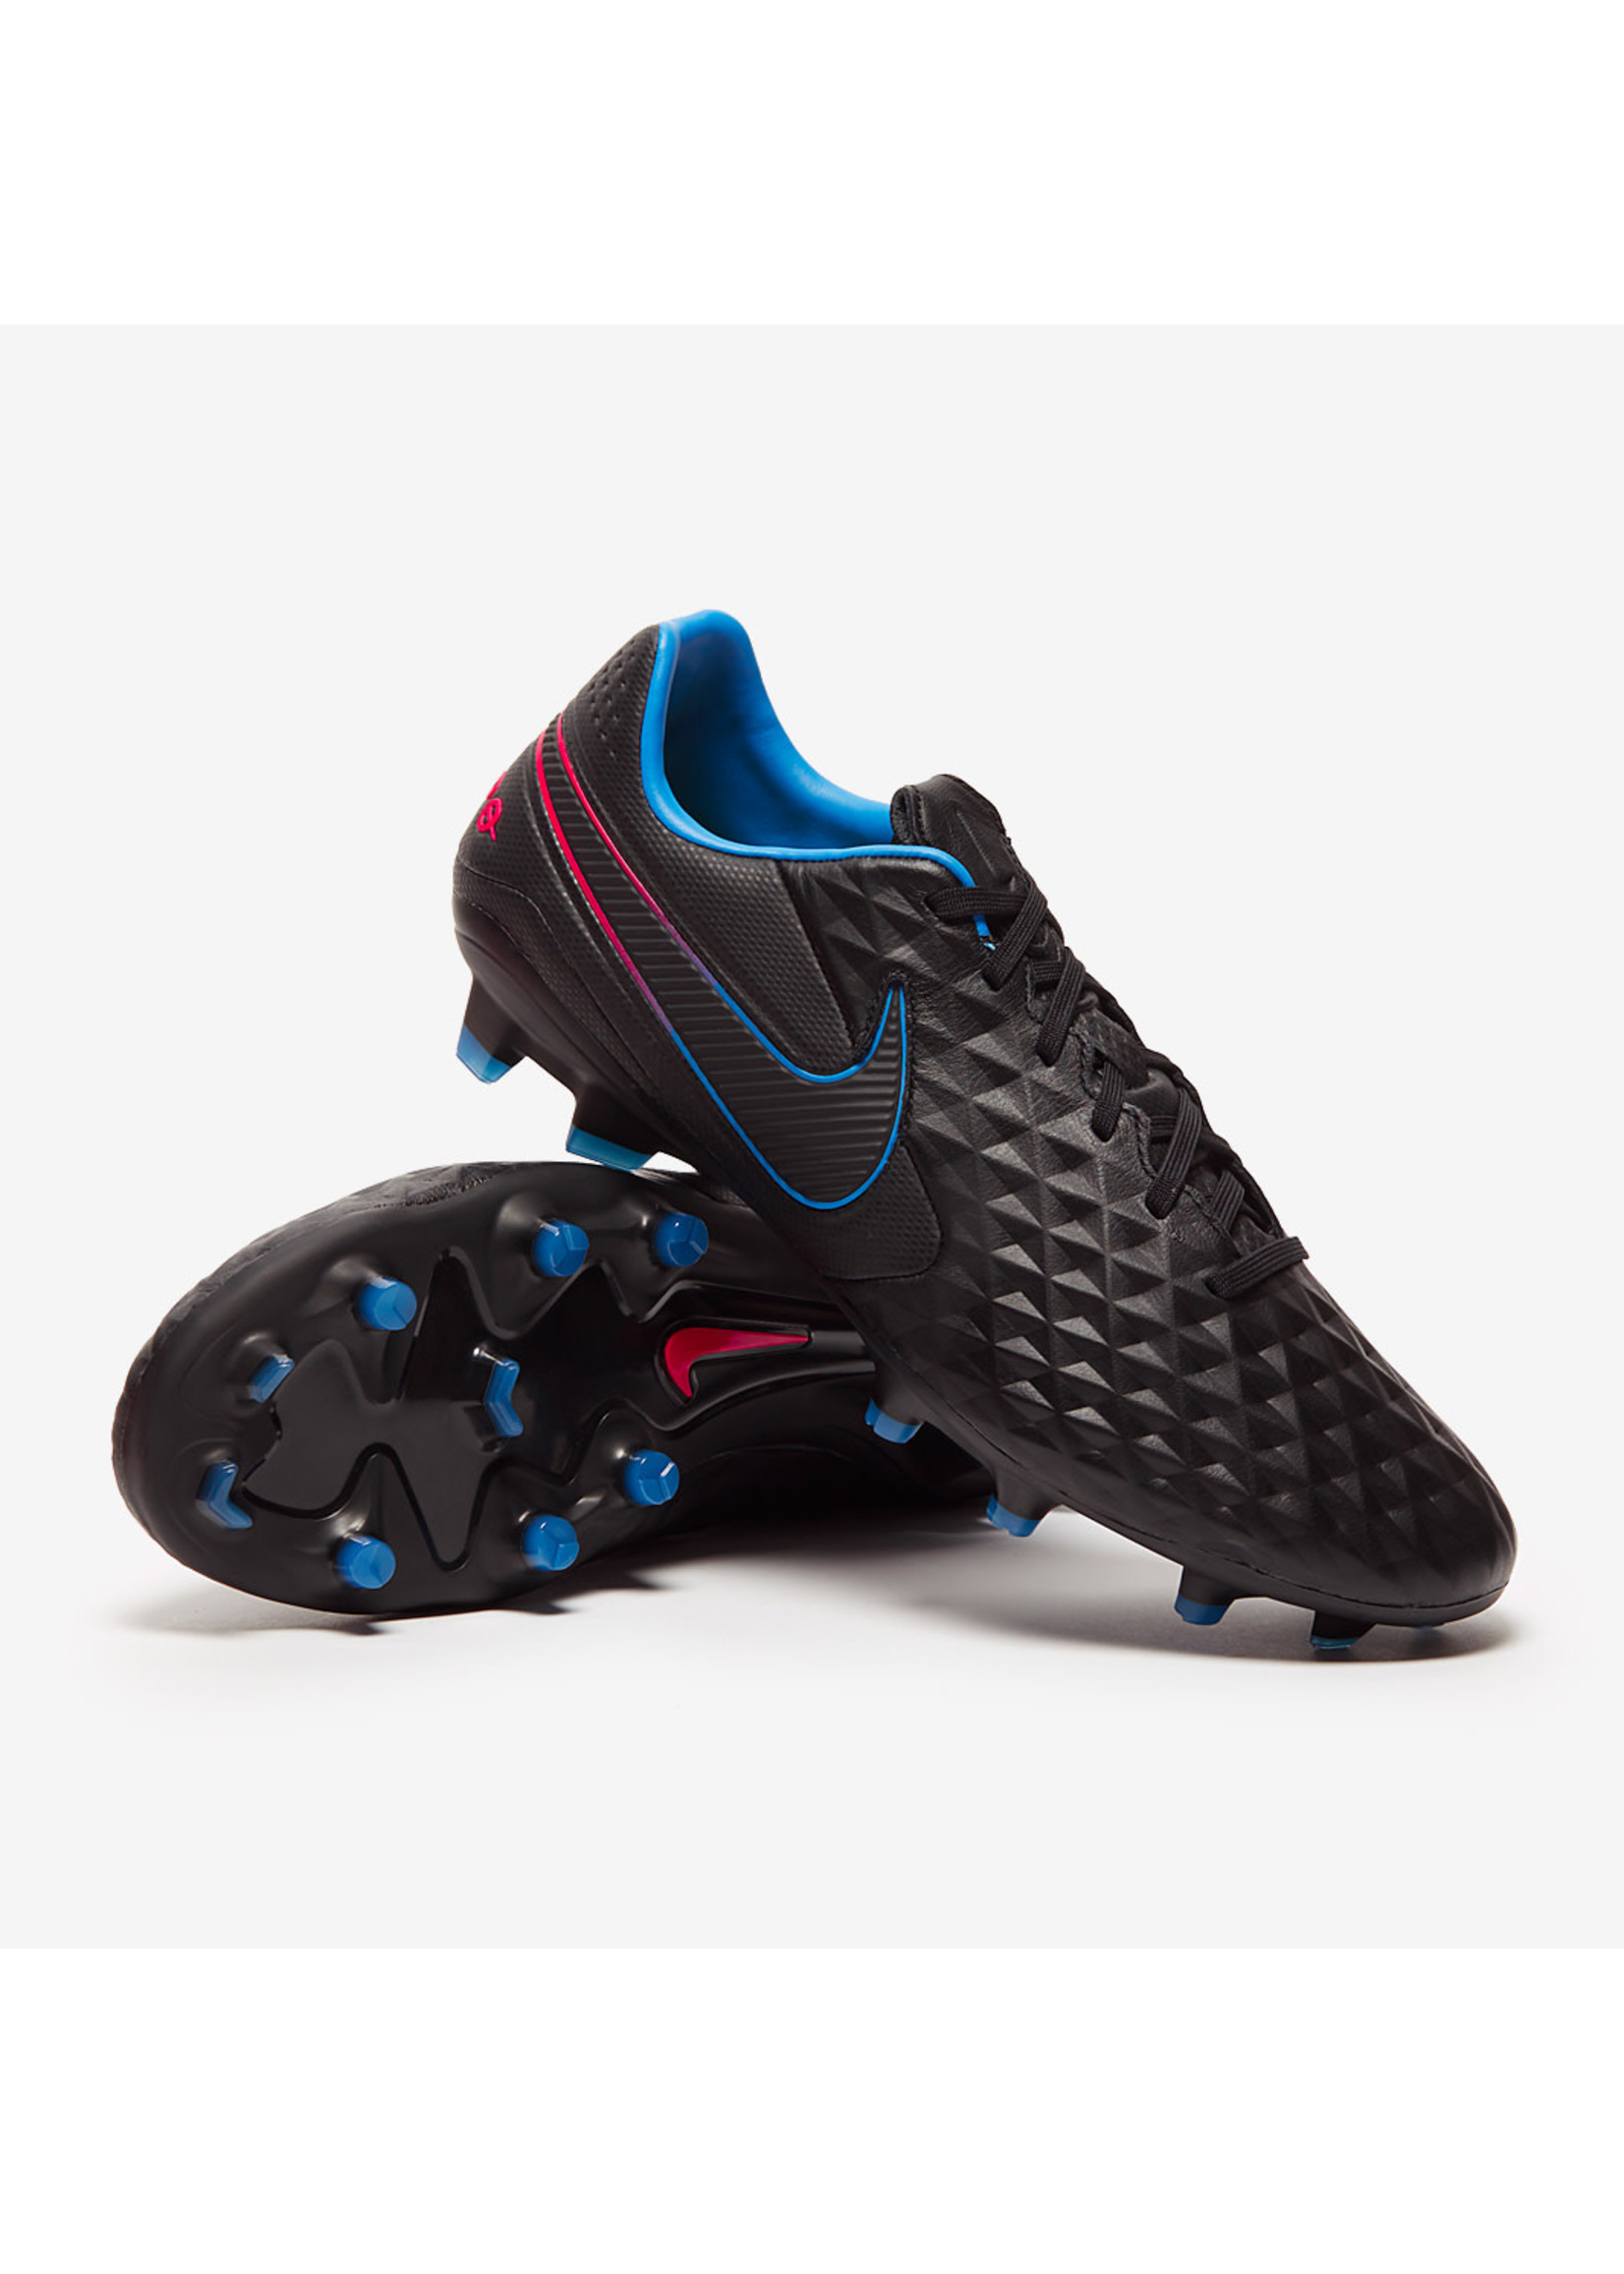 Nike LEGEND 8 PRO FG